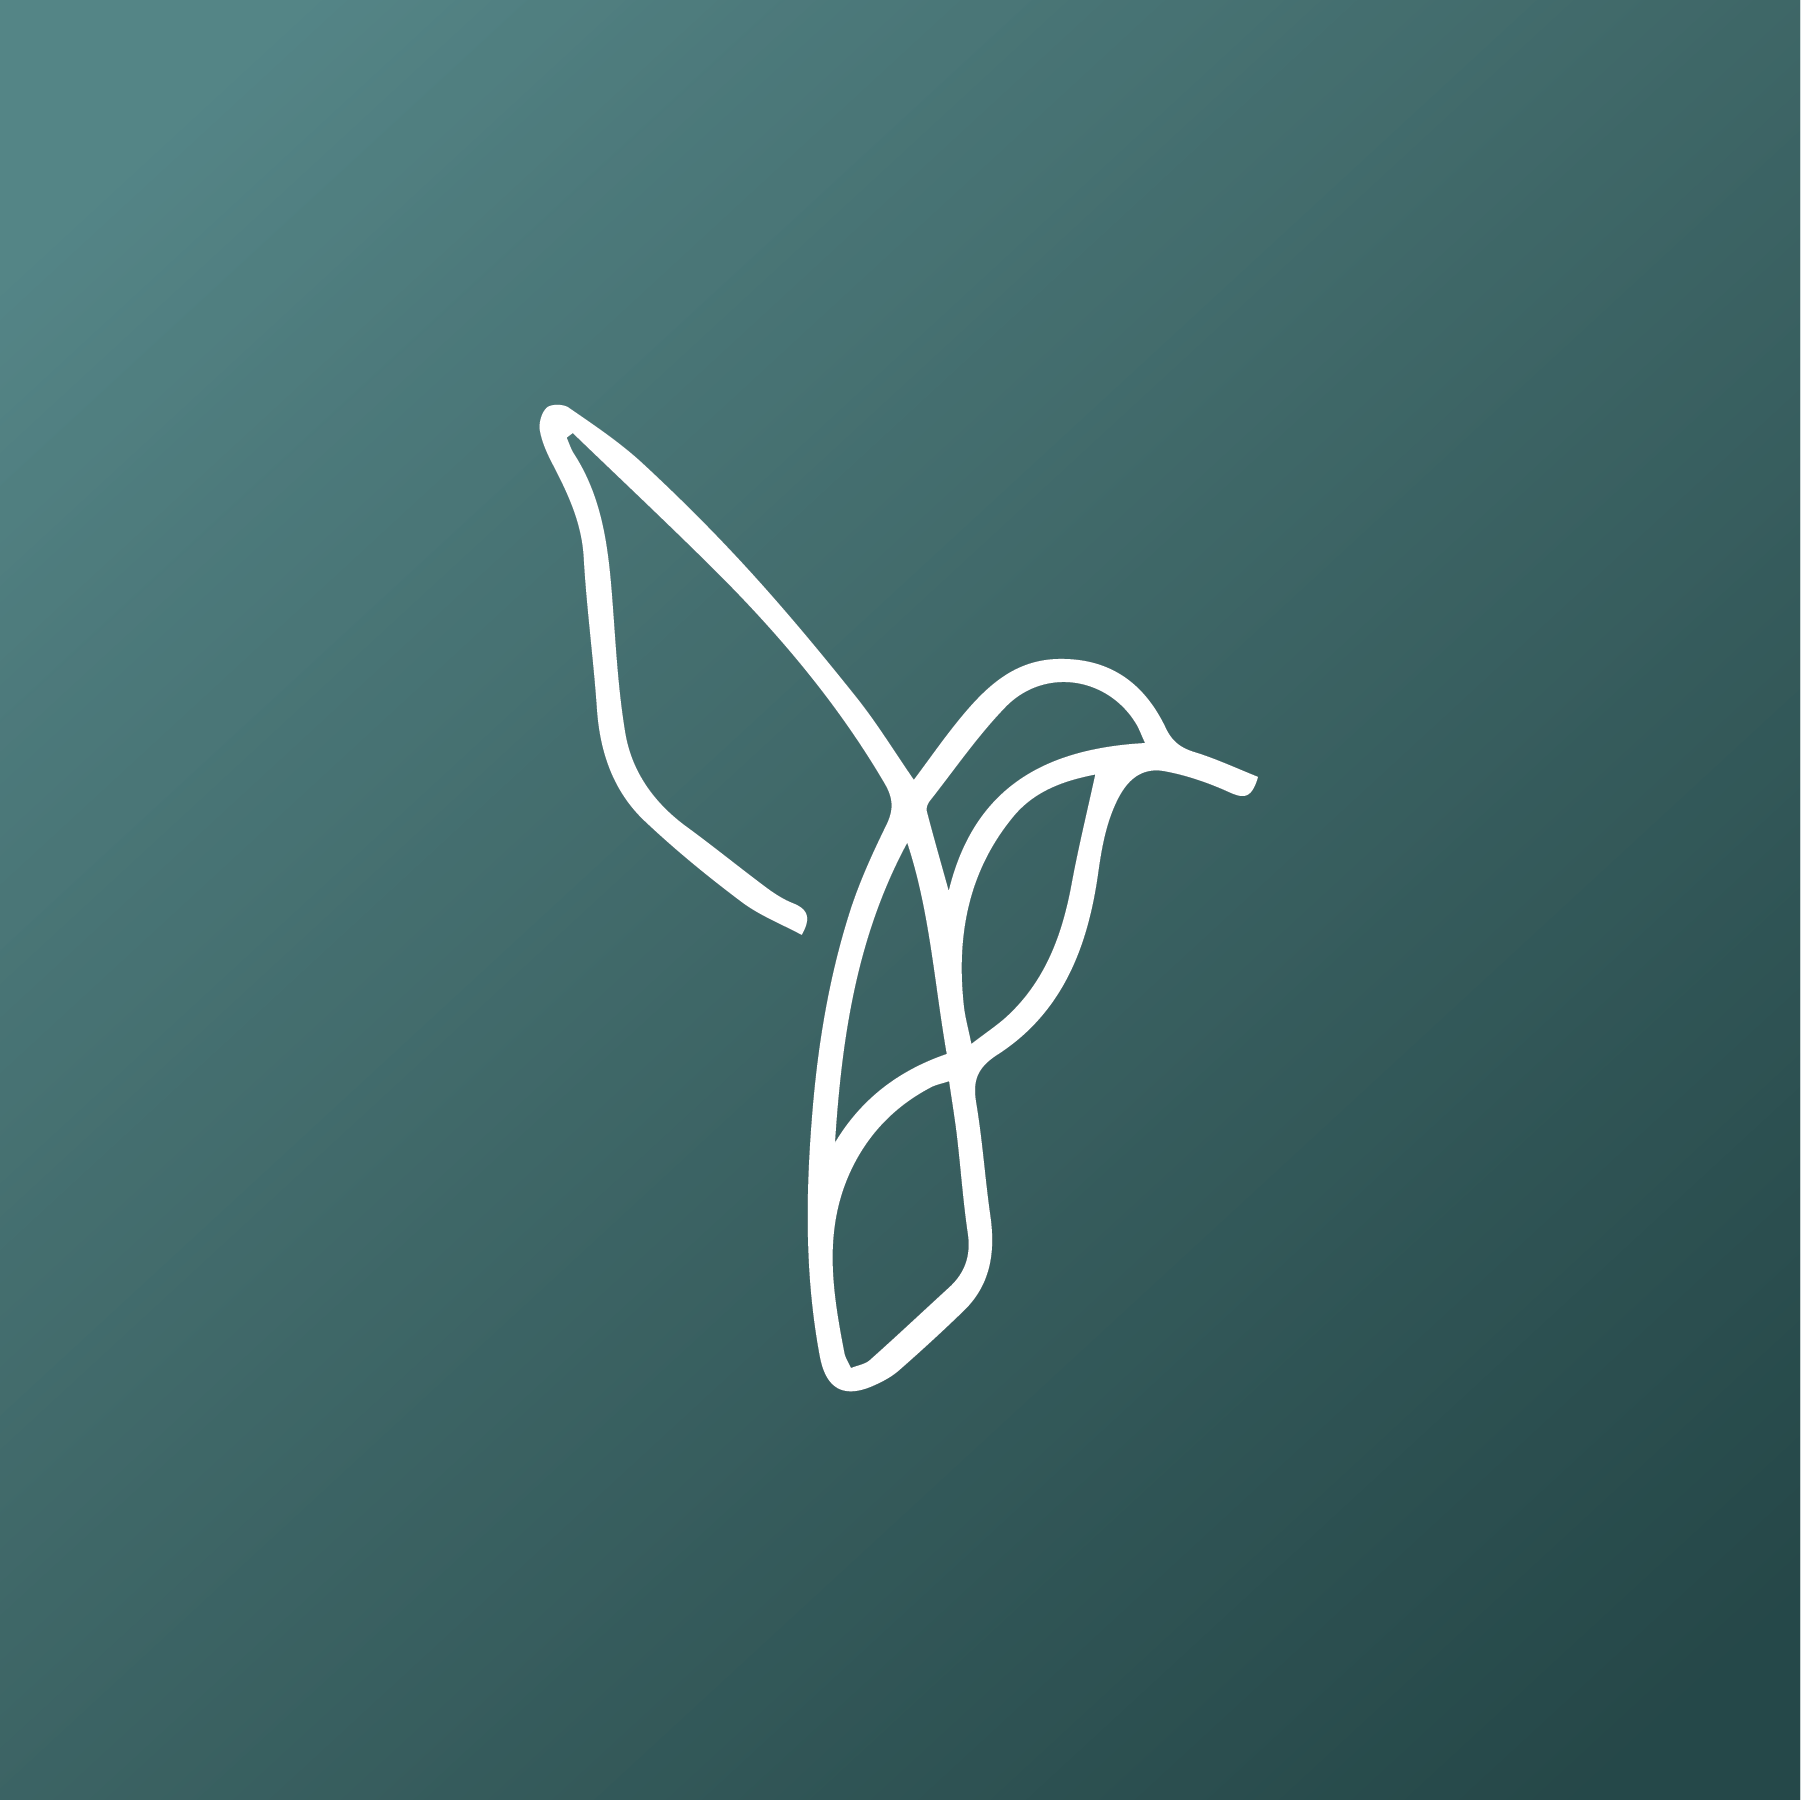 Hummingbird Logo Icon Creative Branding Creative Branding Design Branding Design Studio